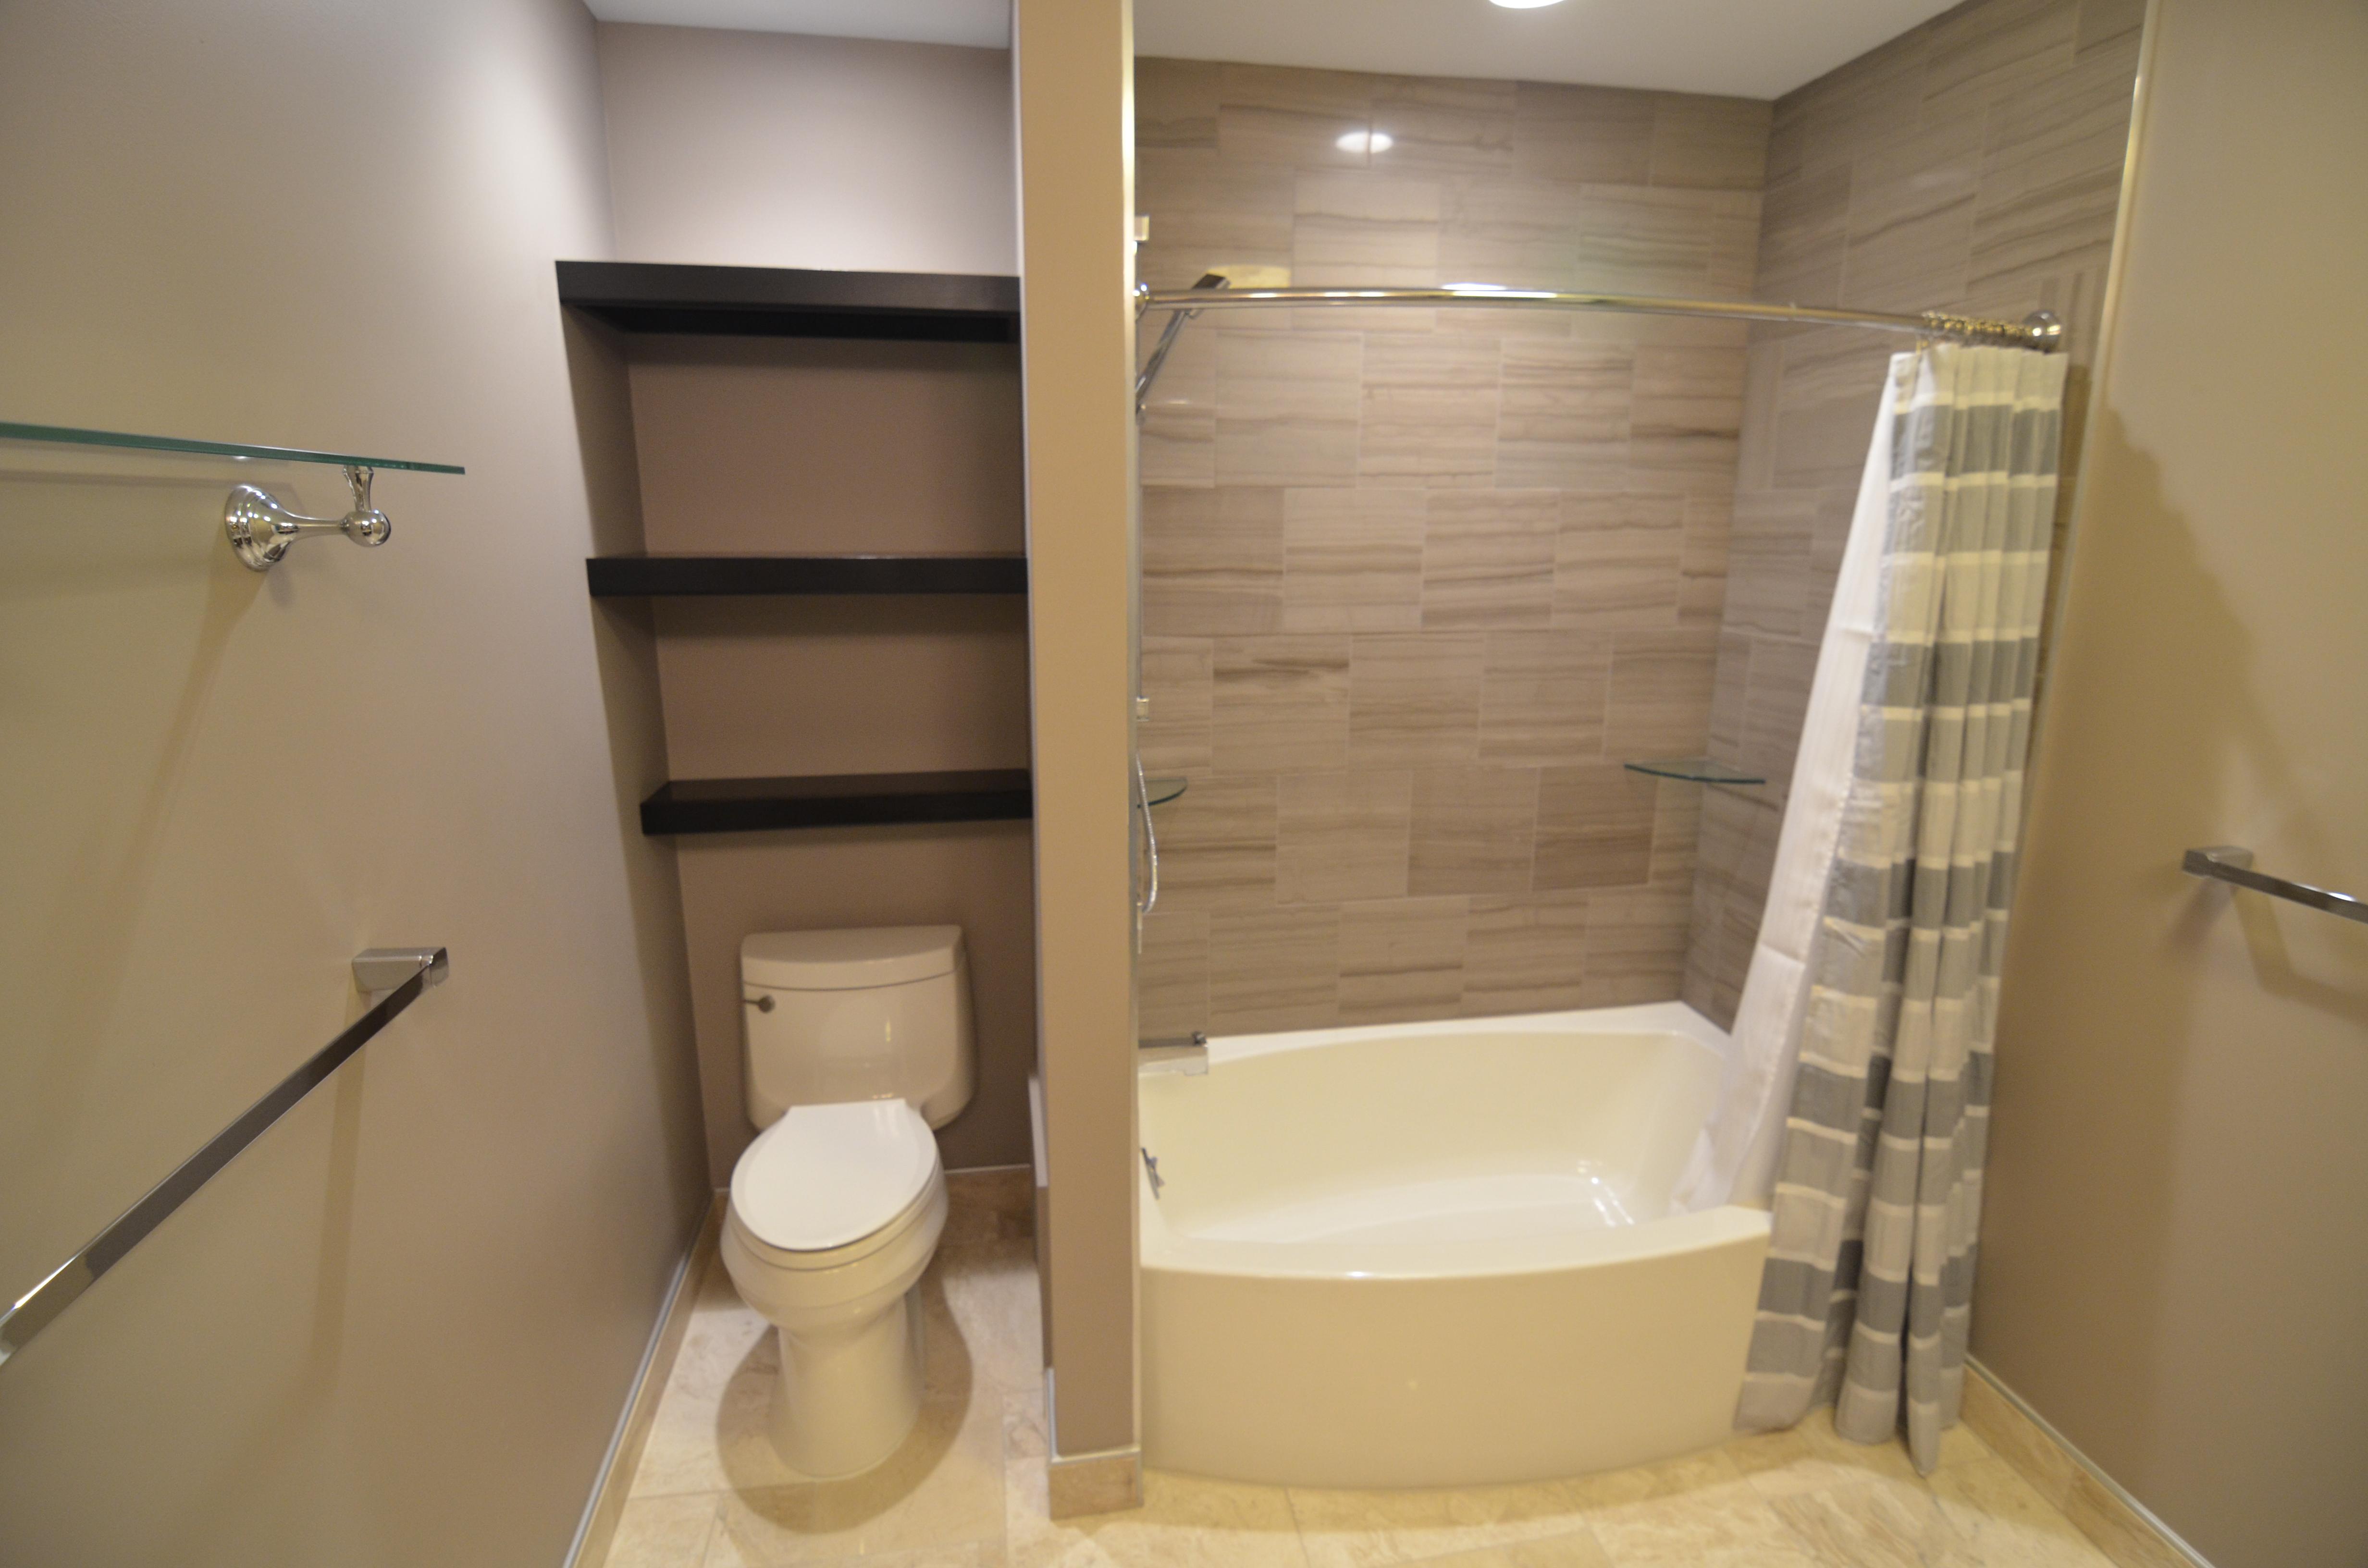 bathroom gallery | next level remodeling